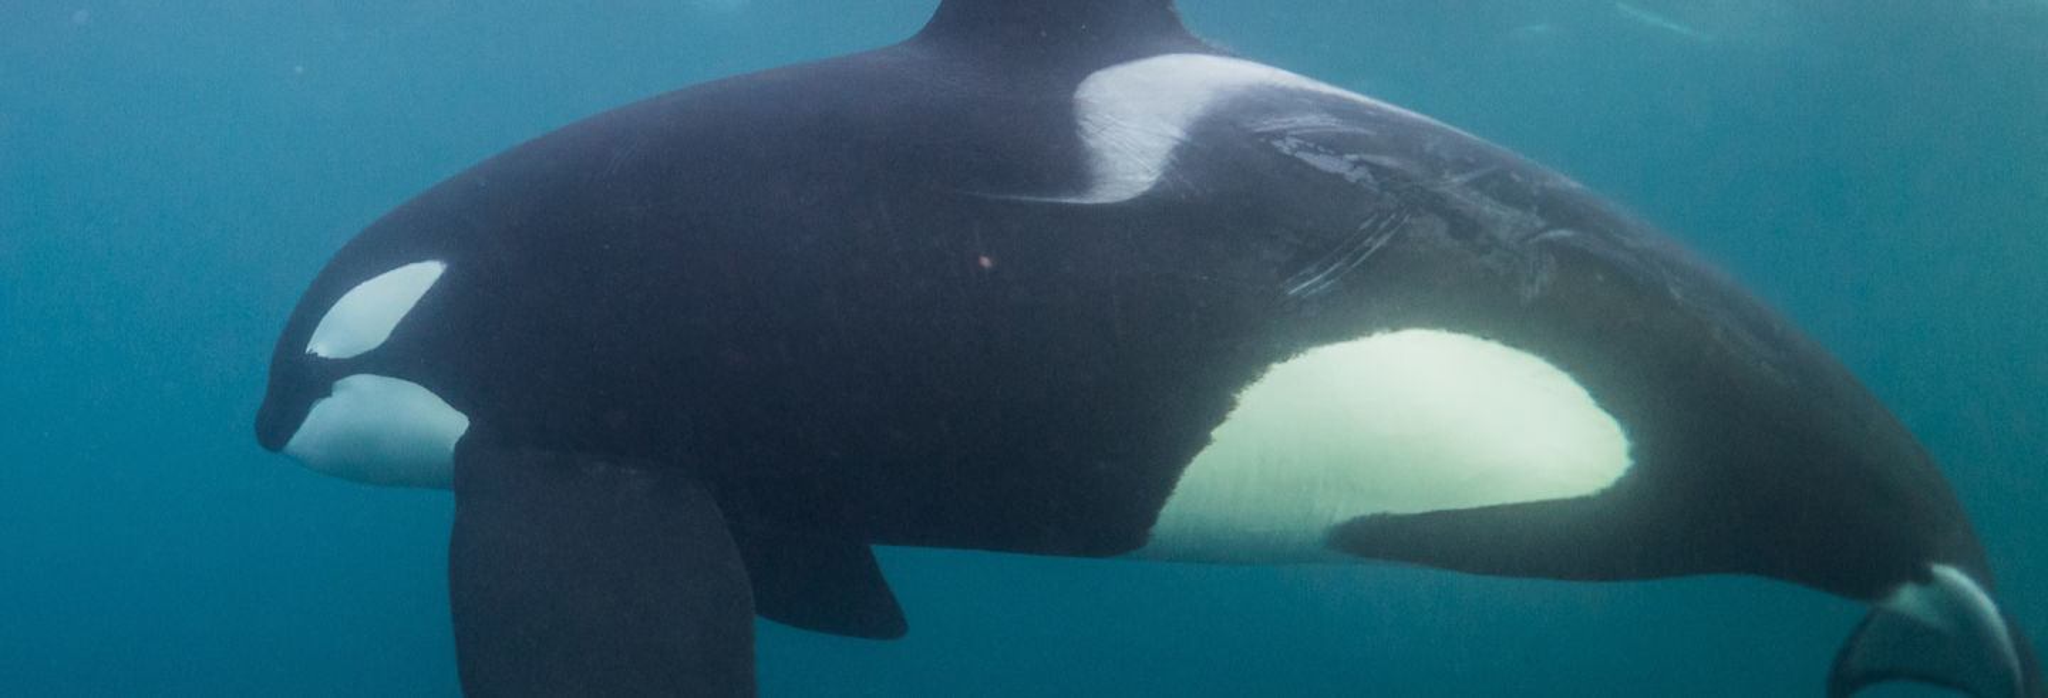 Avvistamento di balene nei fiordi norvegesi